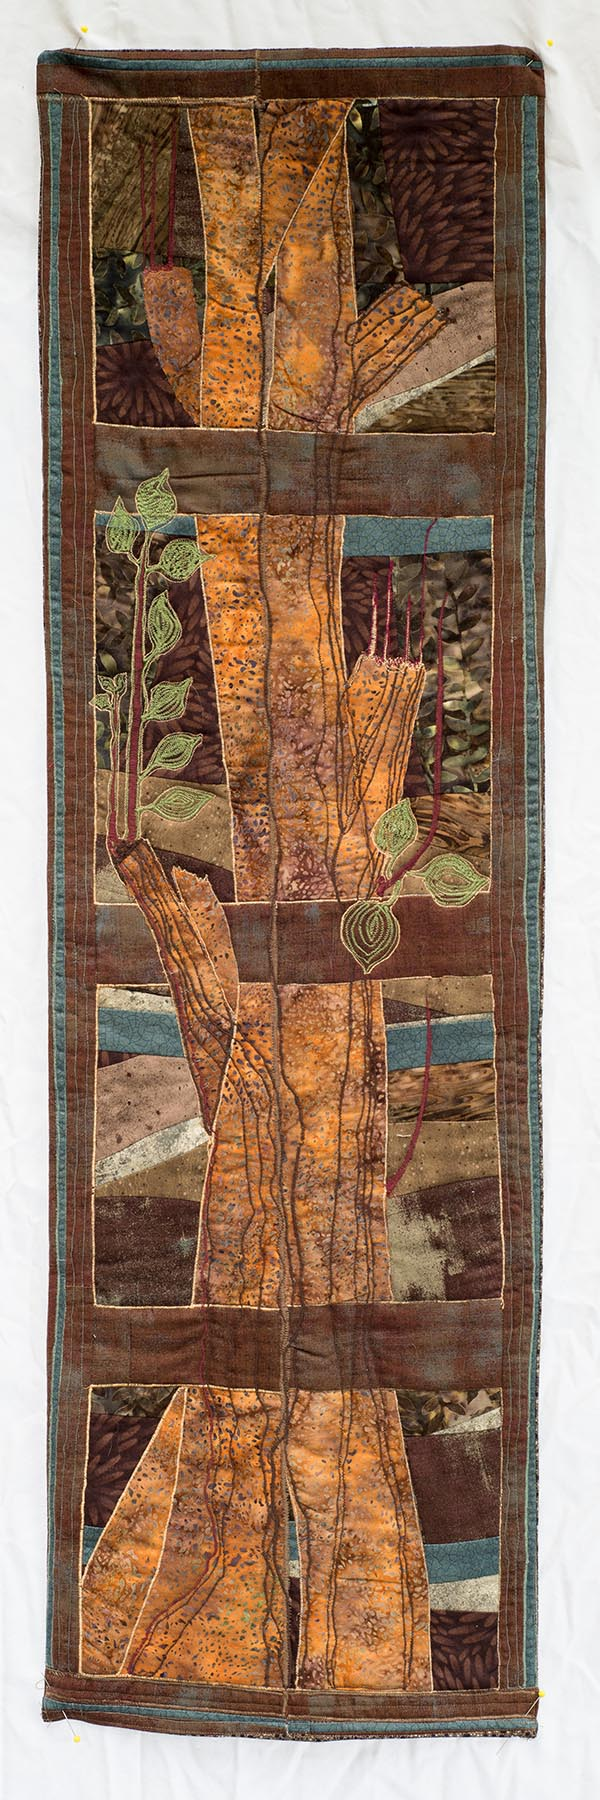 #sylvialeo, #pittsburgh, #pittsburghartist, #quilt, #tree